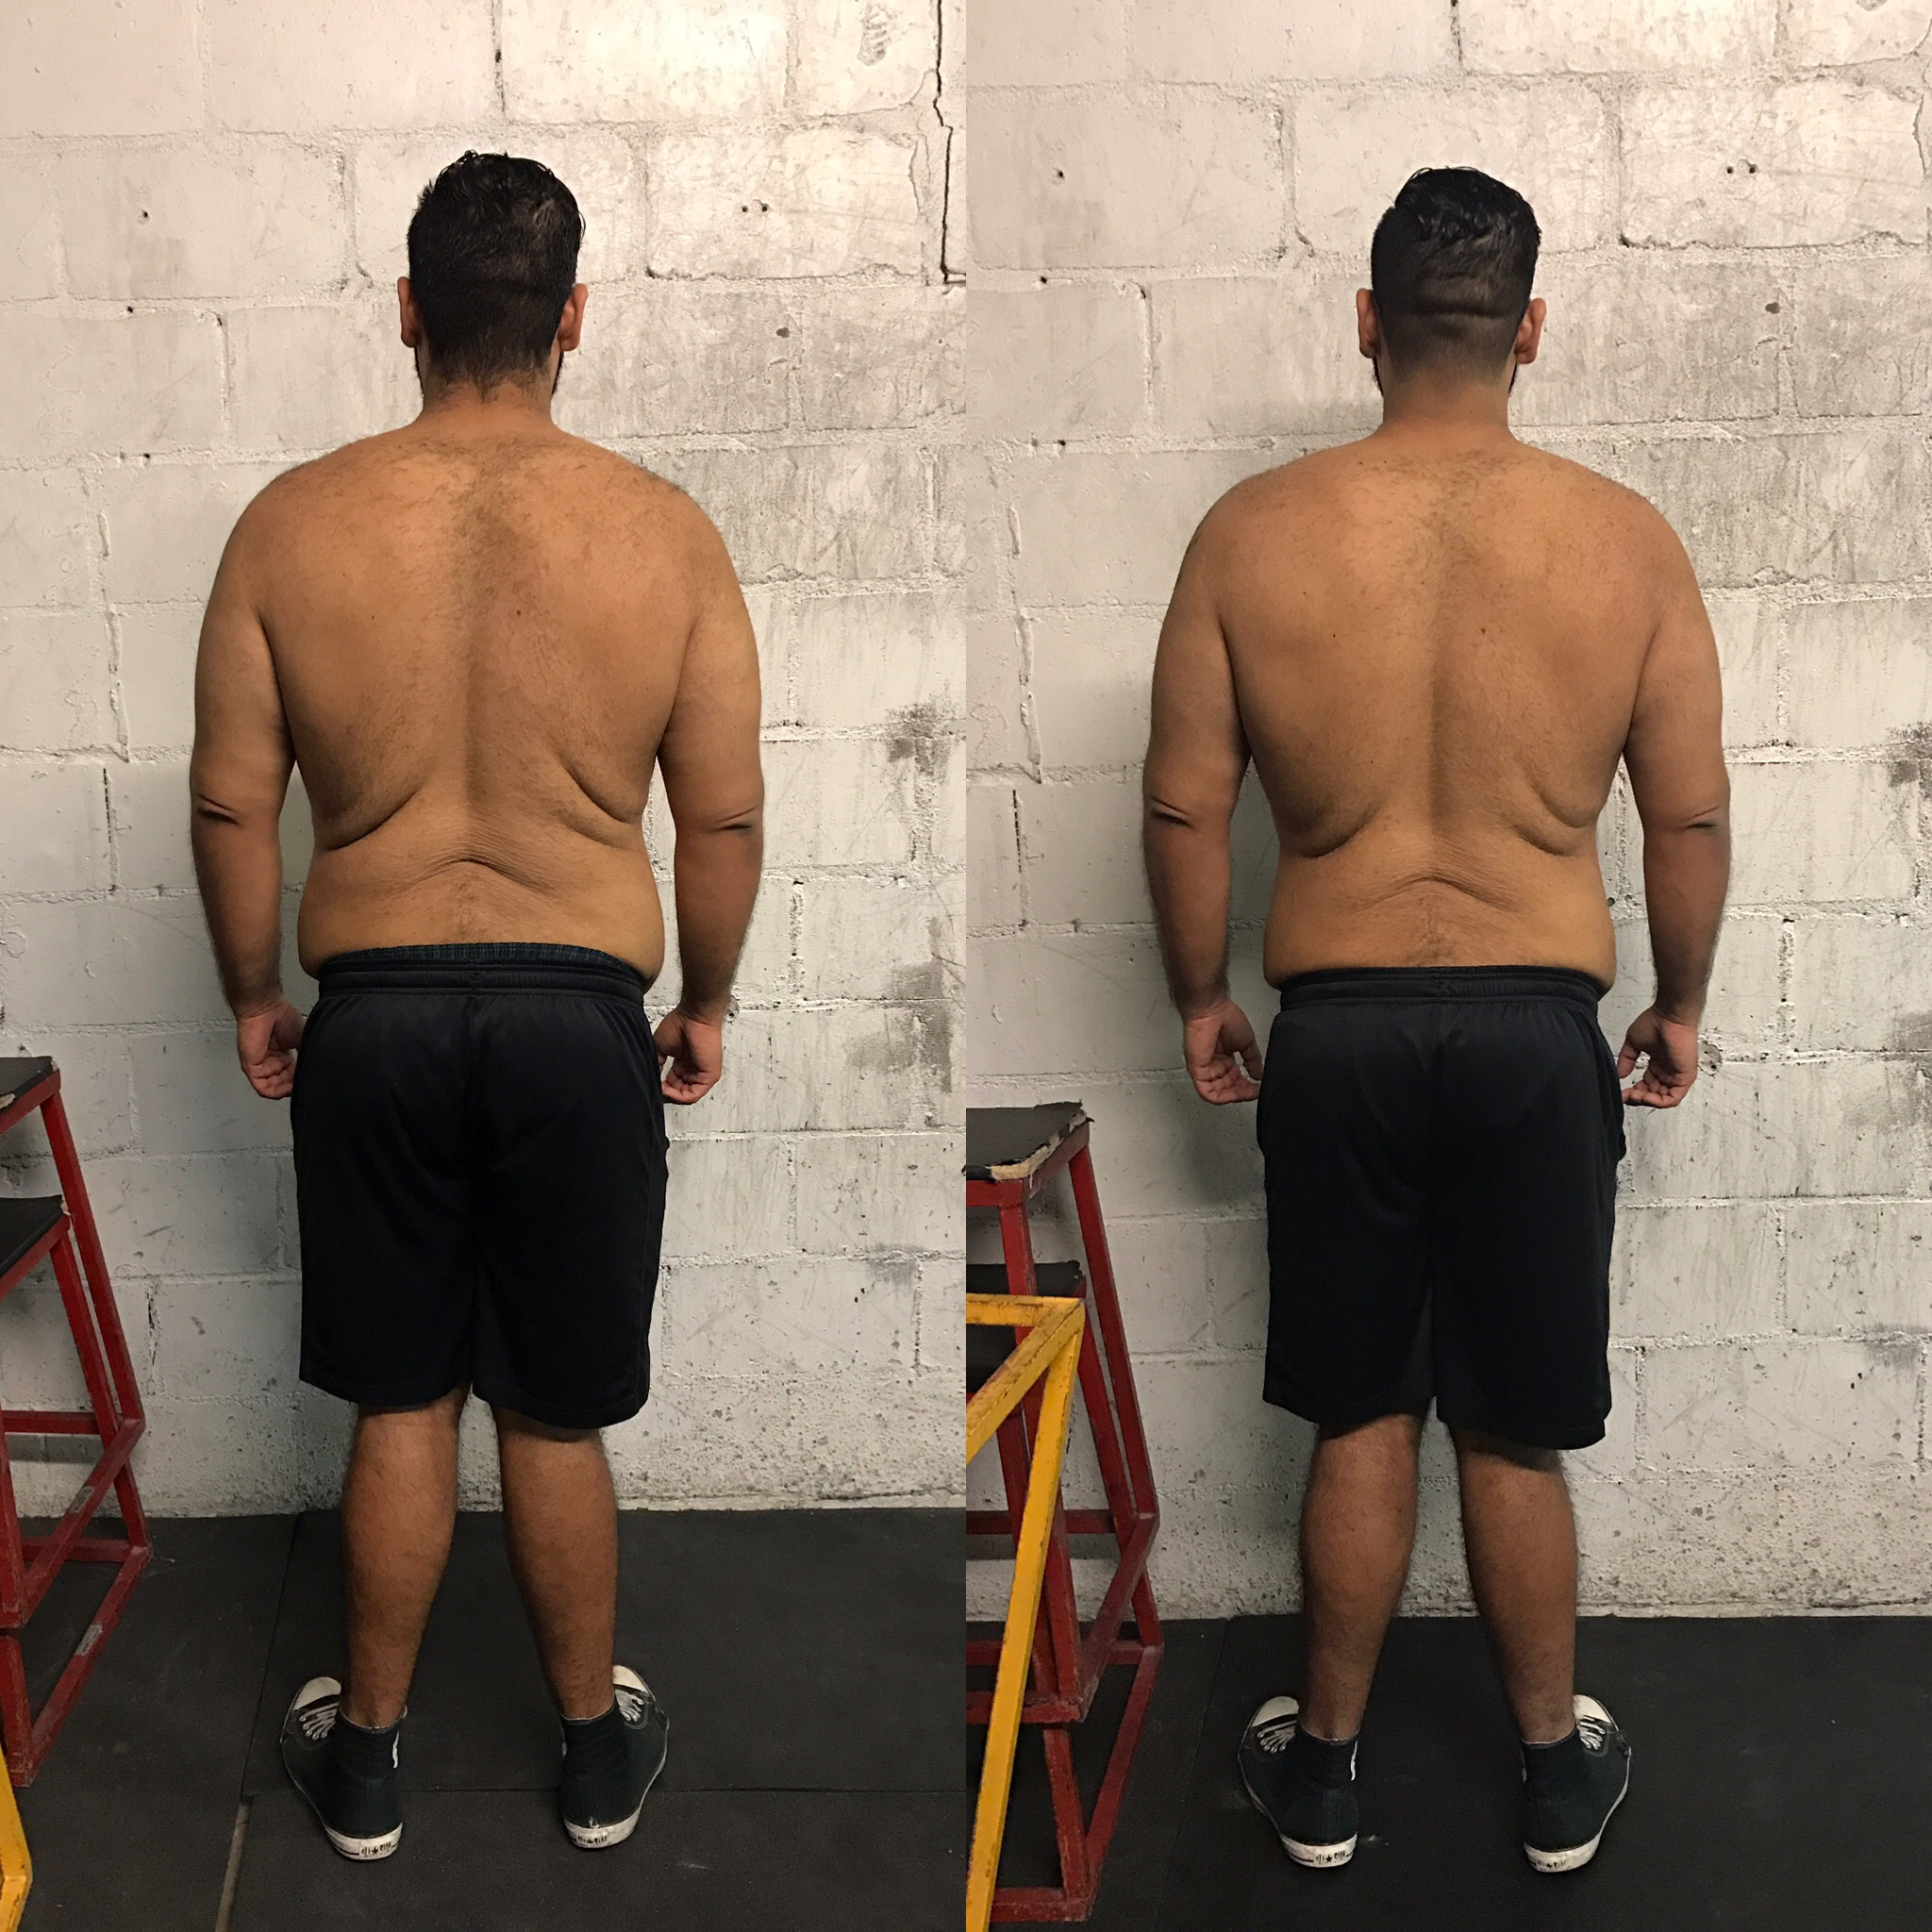 L-R, Nov. 2, 2016, Dec. 6, 2016. 15 pounds weight loss.